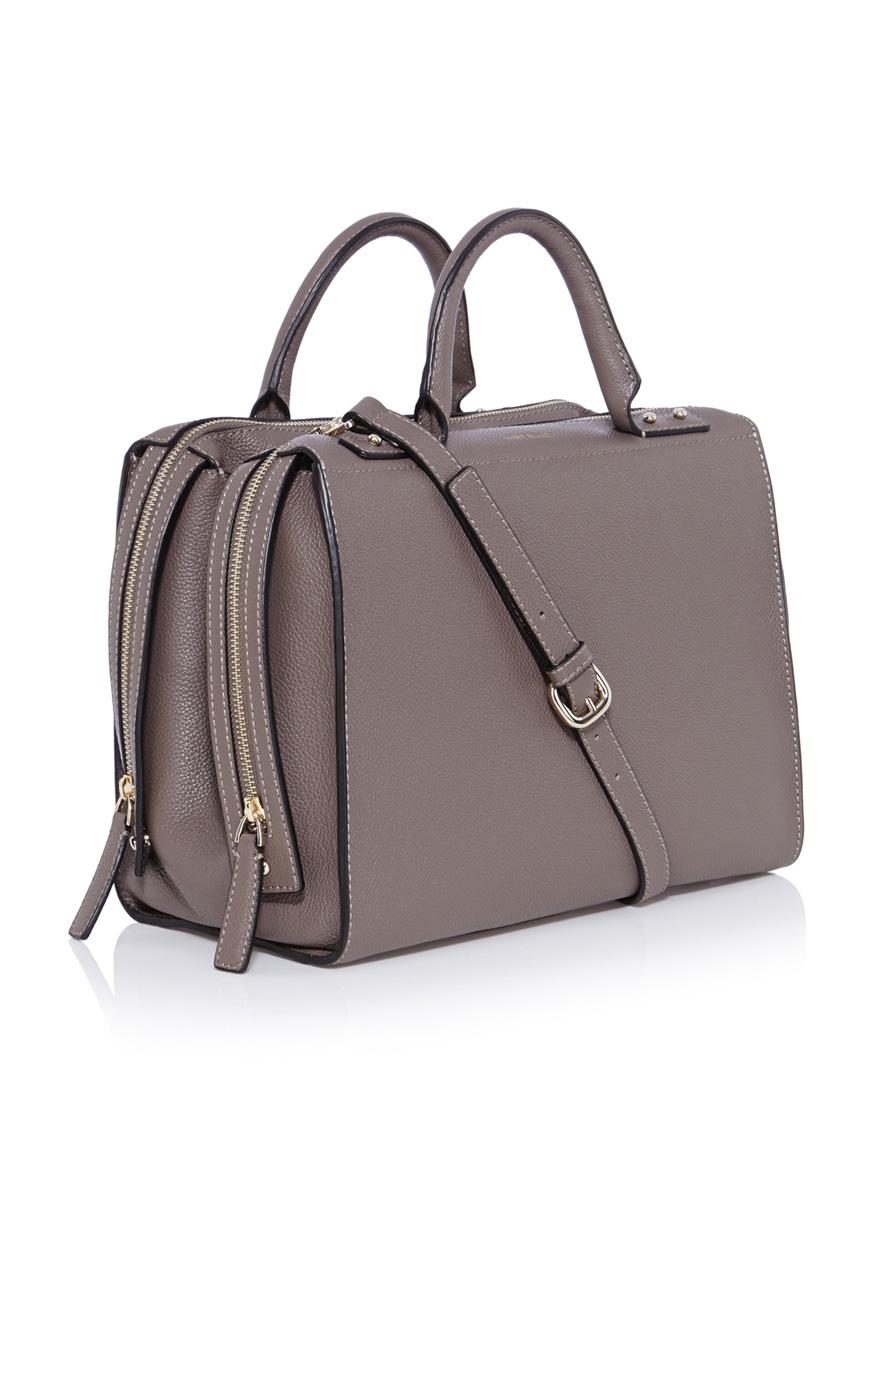 Karen Millen Large Leather Box Bag In Brown Lyst